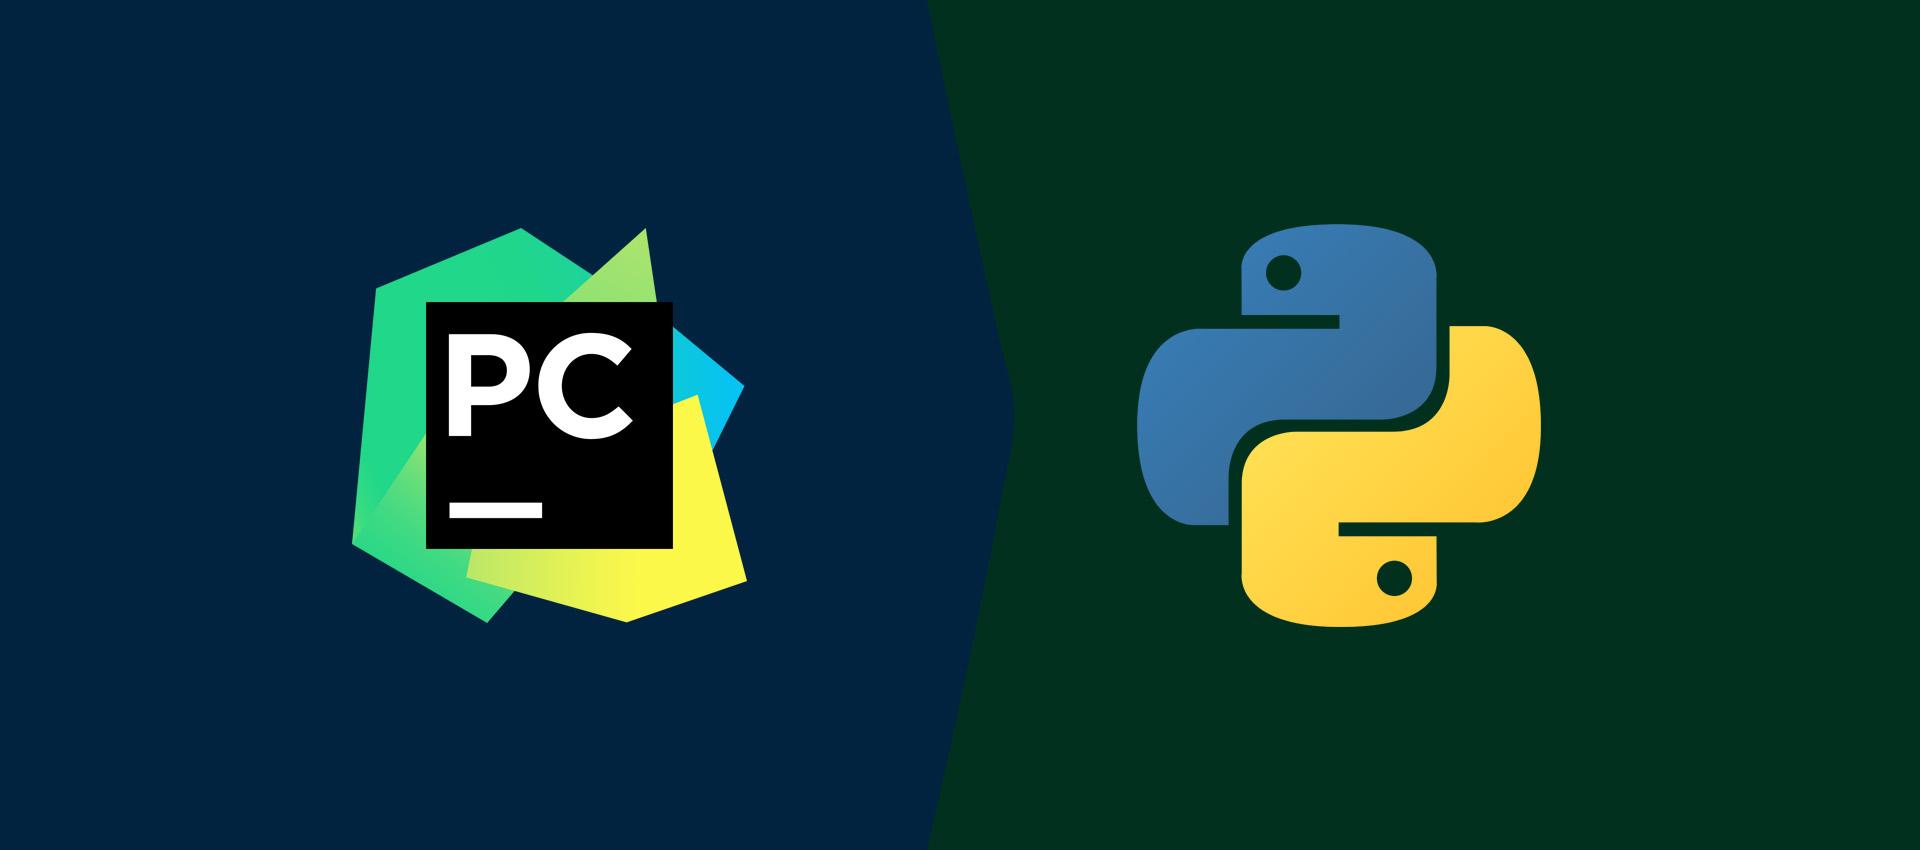 How To Install PyCharm For Python On Ubuntu